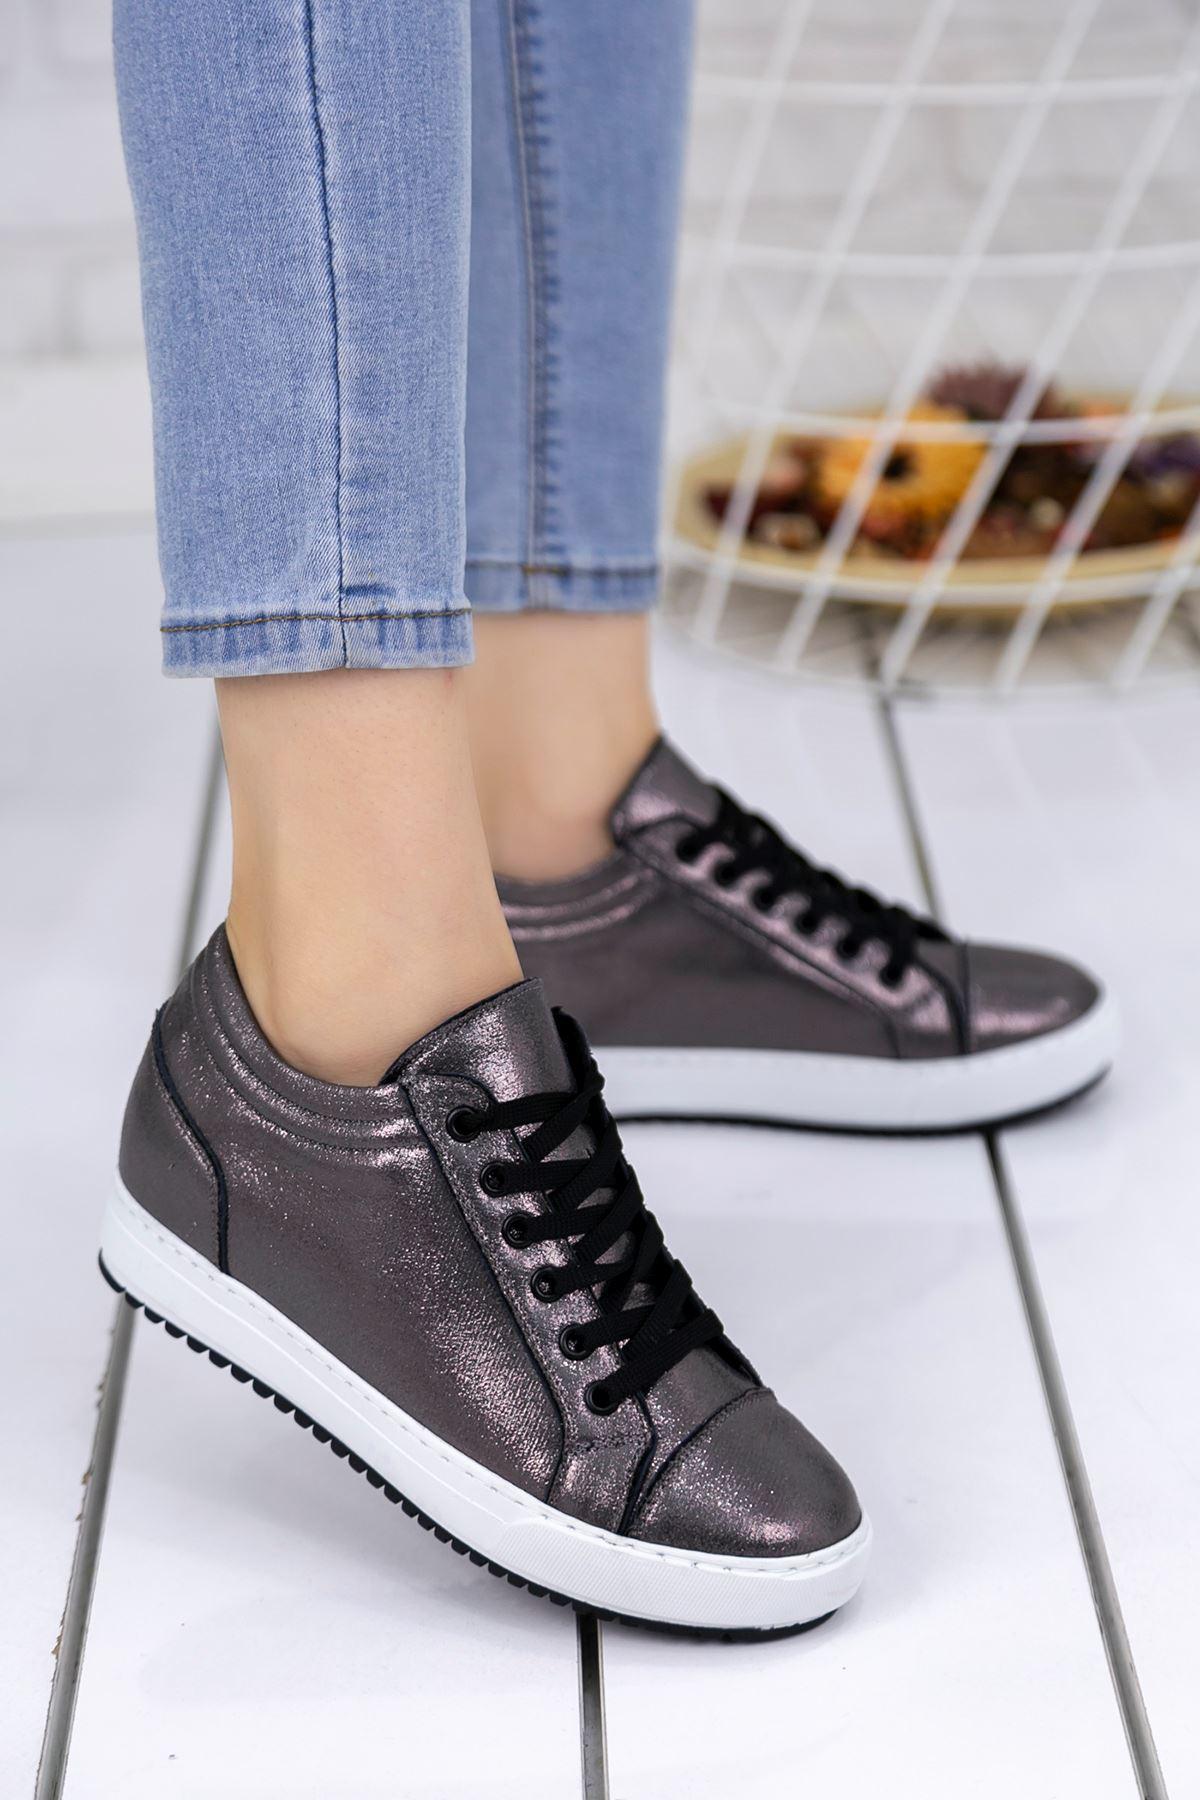 Adonia Füme Cilt Gizli Topuklu Ortapedik Bayan Spor Ayakkabı